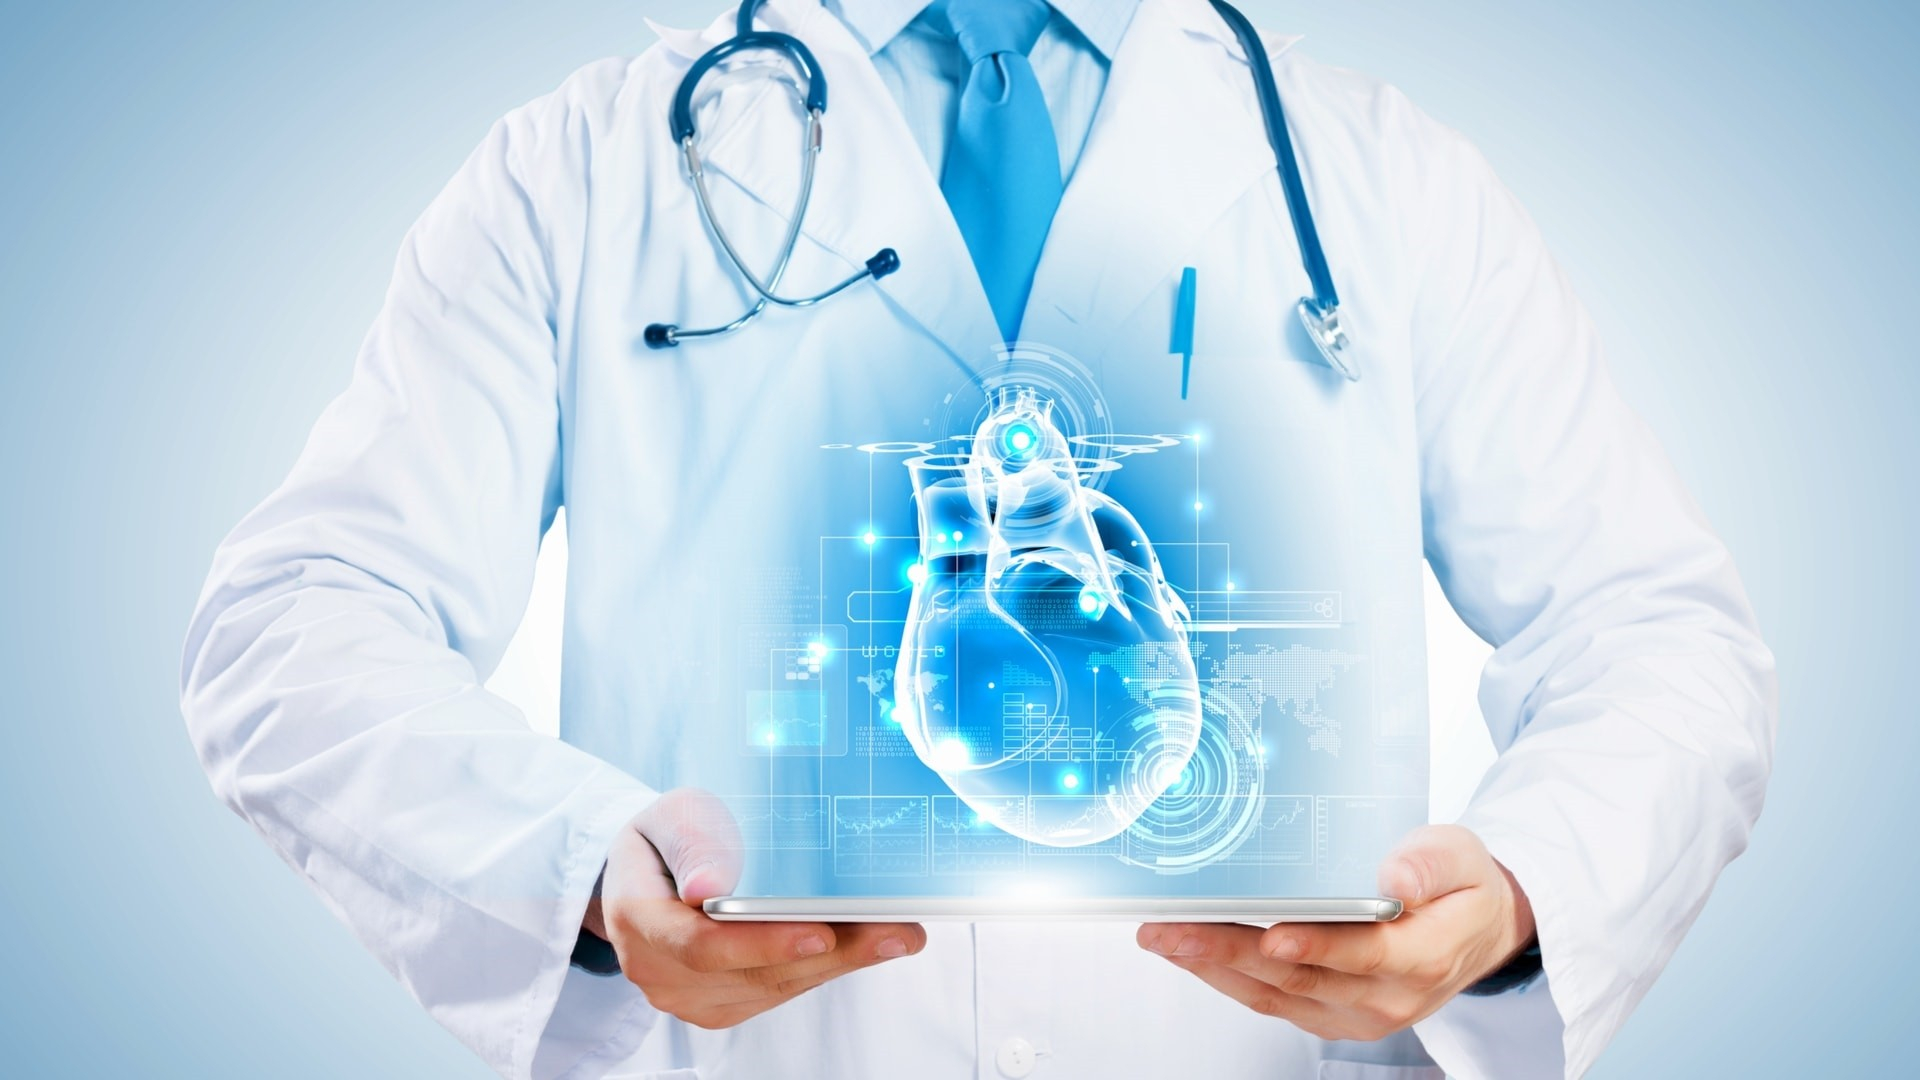 Medical Wallpaper